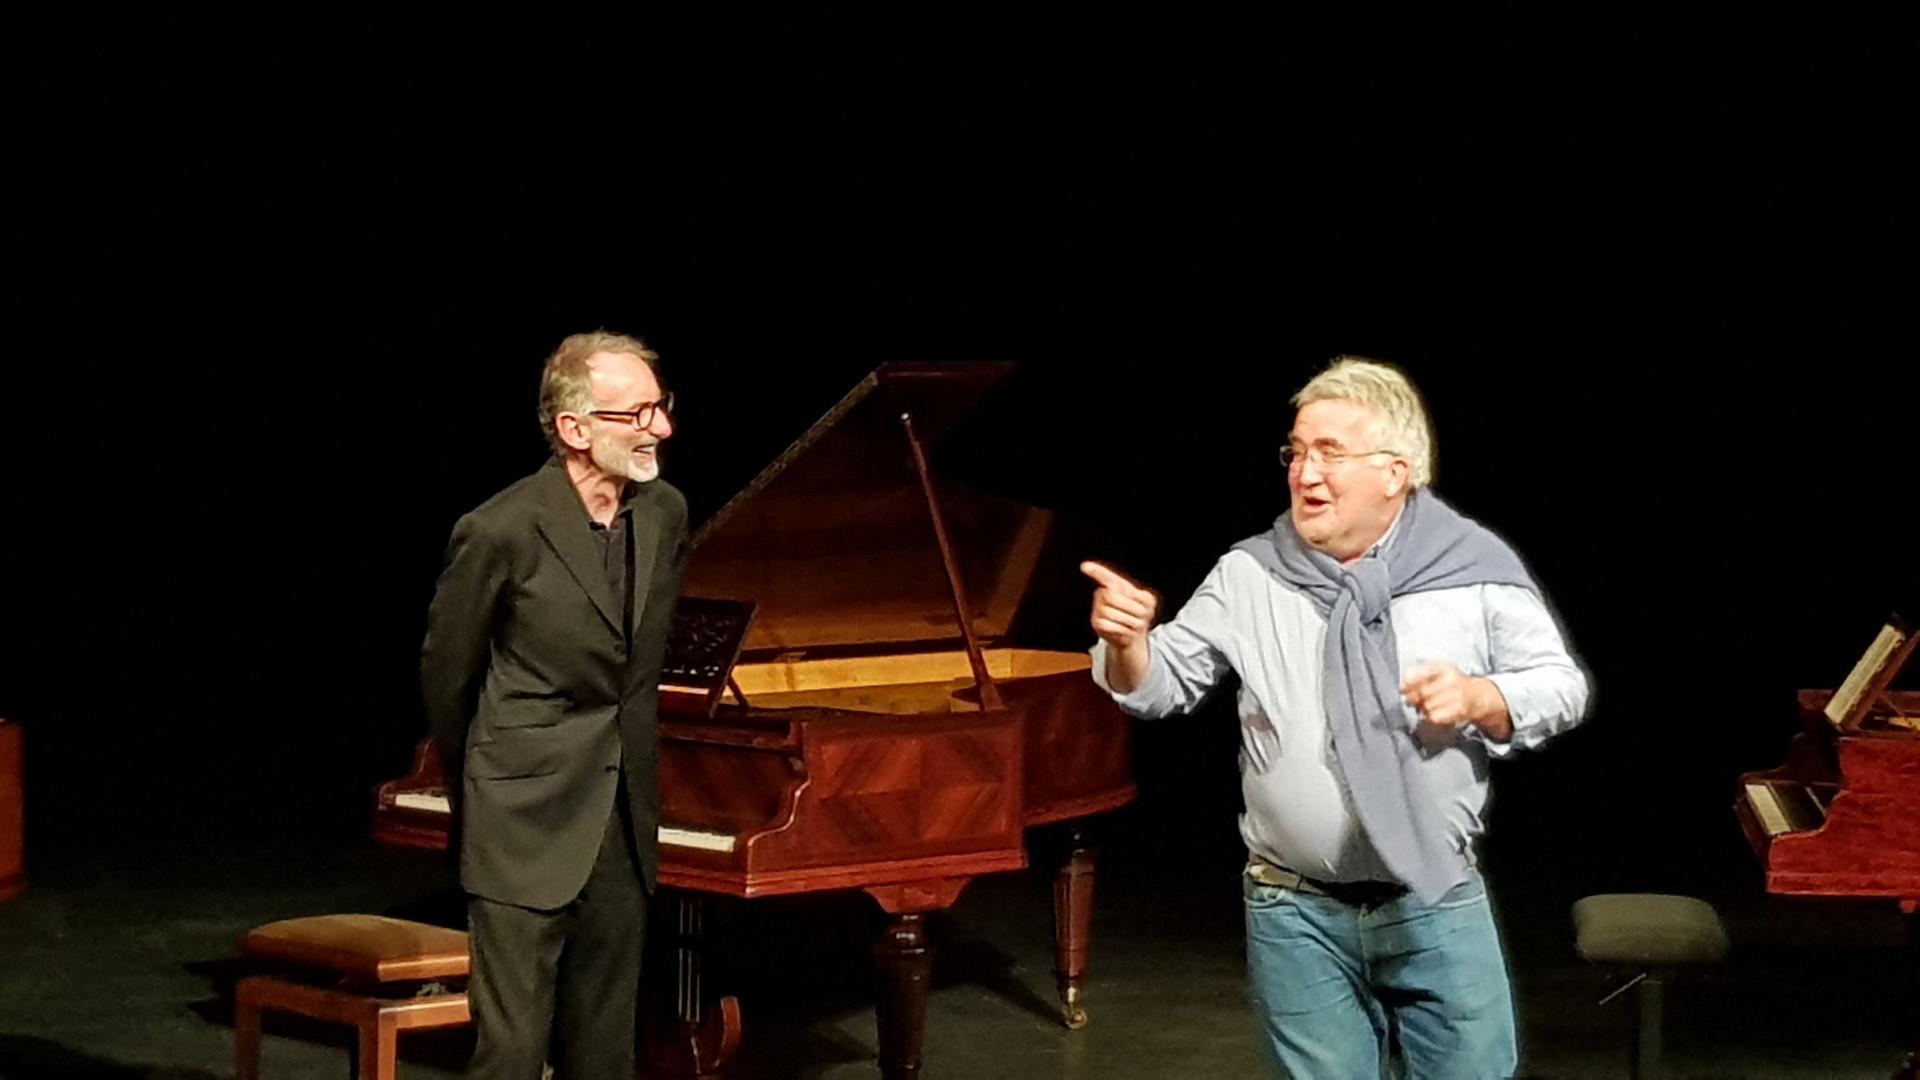 Jean Manifacier et Jean-François Tobias